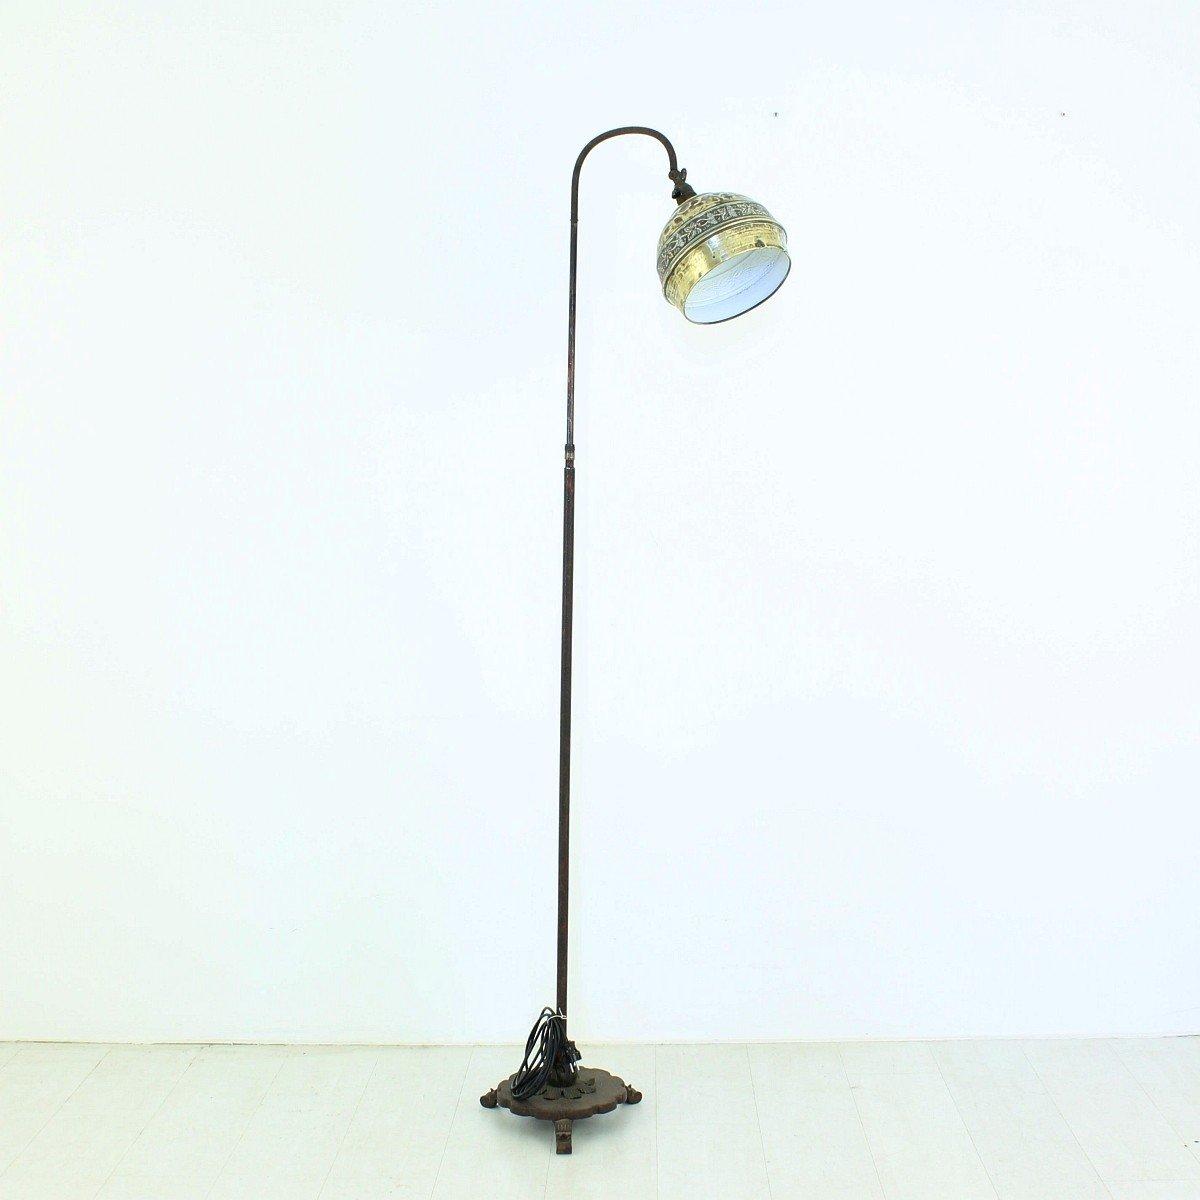 messing eisen stehlampe 1920er bei pamono kaufen. Black Bedroom Furniture Sets. Home Design Ideas